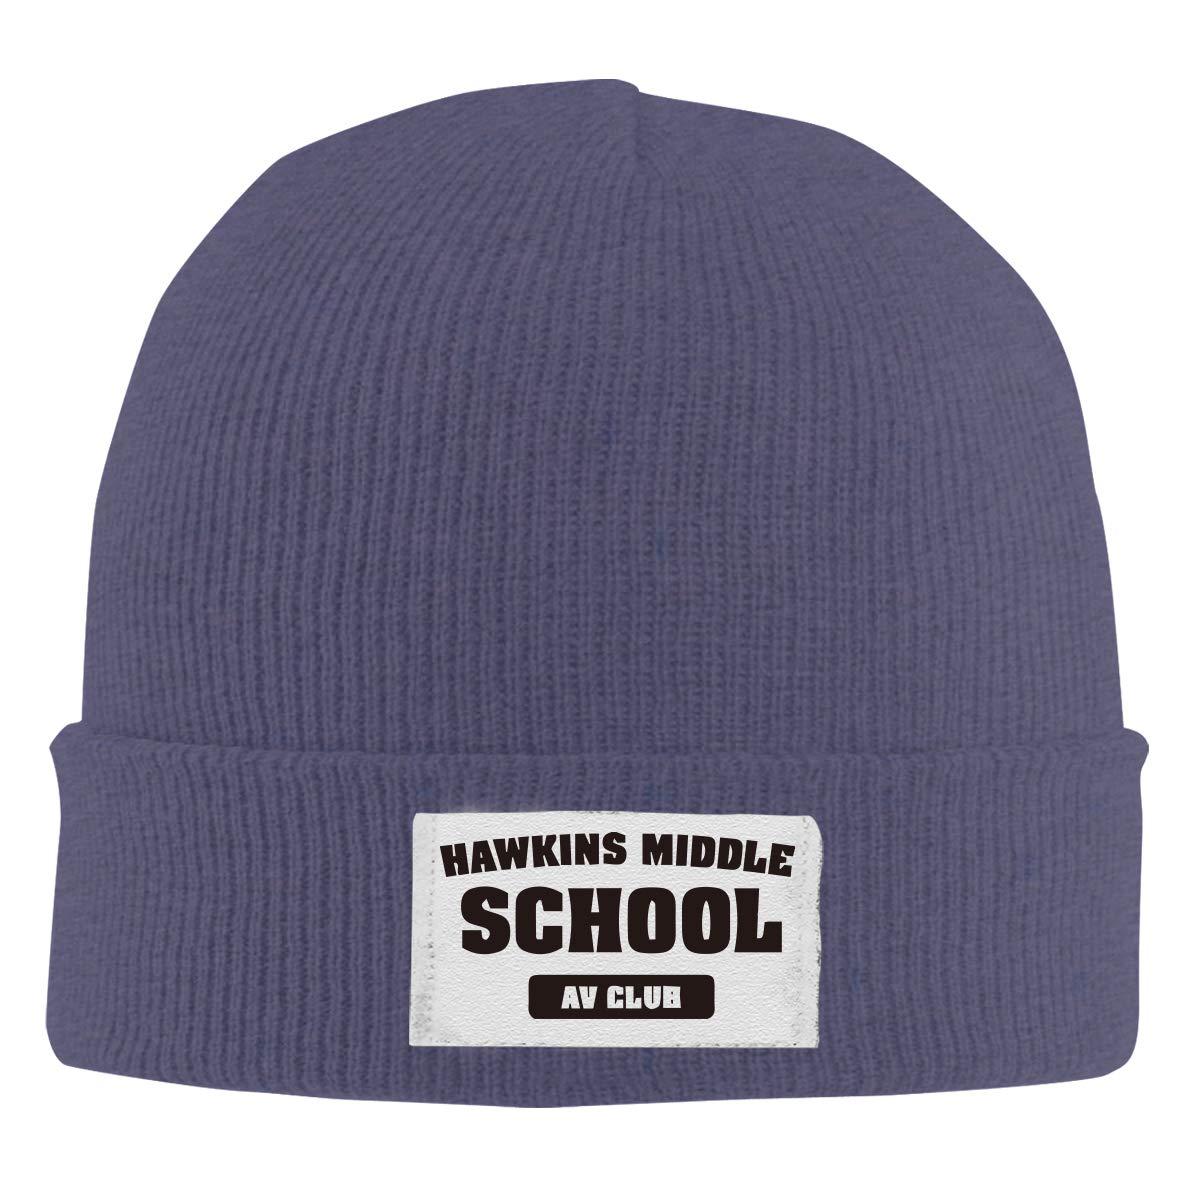 Stretchy Cuff Beanie Hat Black Skull Caps Hawkings Middle School AV Club Winter Warm Knit Hats